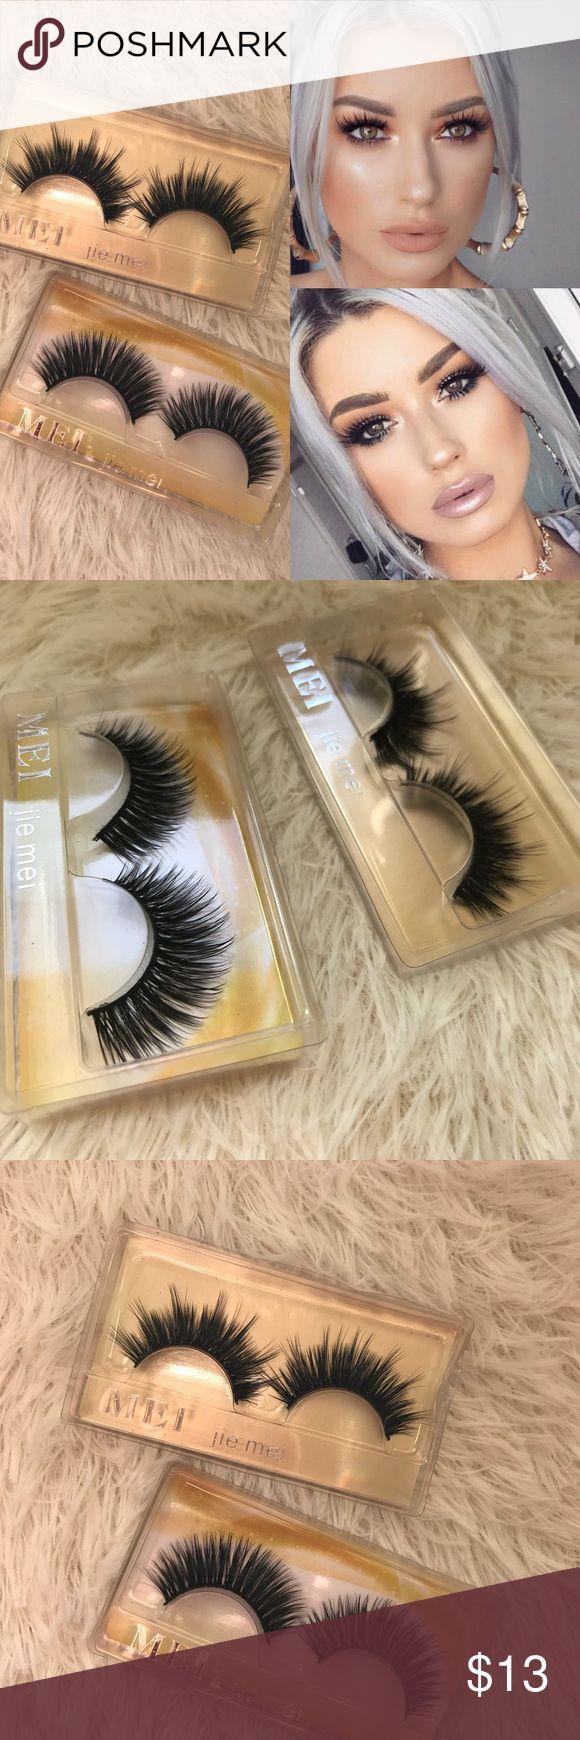 2 Pairs of eyelashes +$2 Add on eyelash Applicator  +$3 Add on eyelash glue Please message me if you want to add them.     # tags Iconic, mink, red cherry eyelashes, house of lashes, doll, kawaii, case, full, natural,  Koko, Ardell, wispies, Demi , makeup, mascara, eyelash applicator, wispy, iconic lashes Makeup False Eyelashes